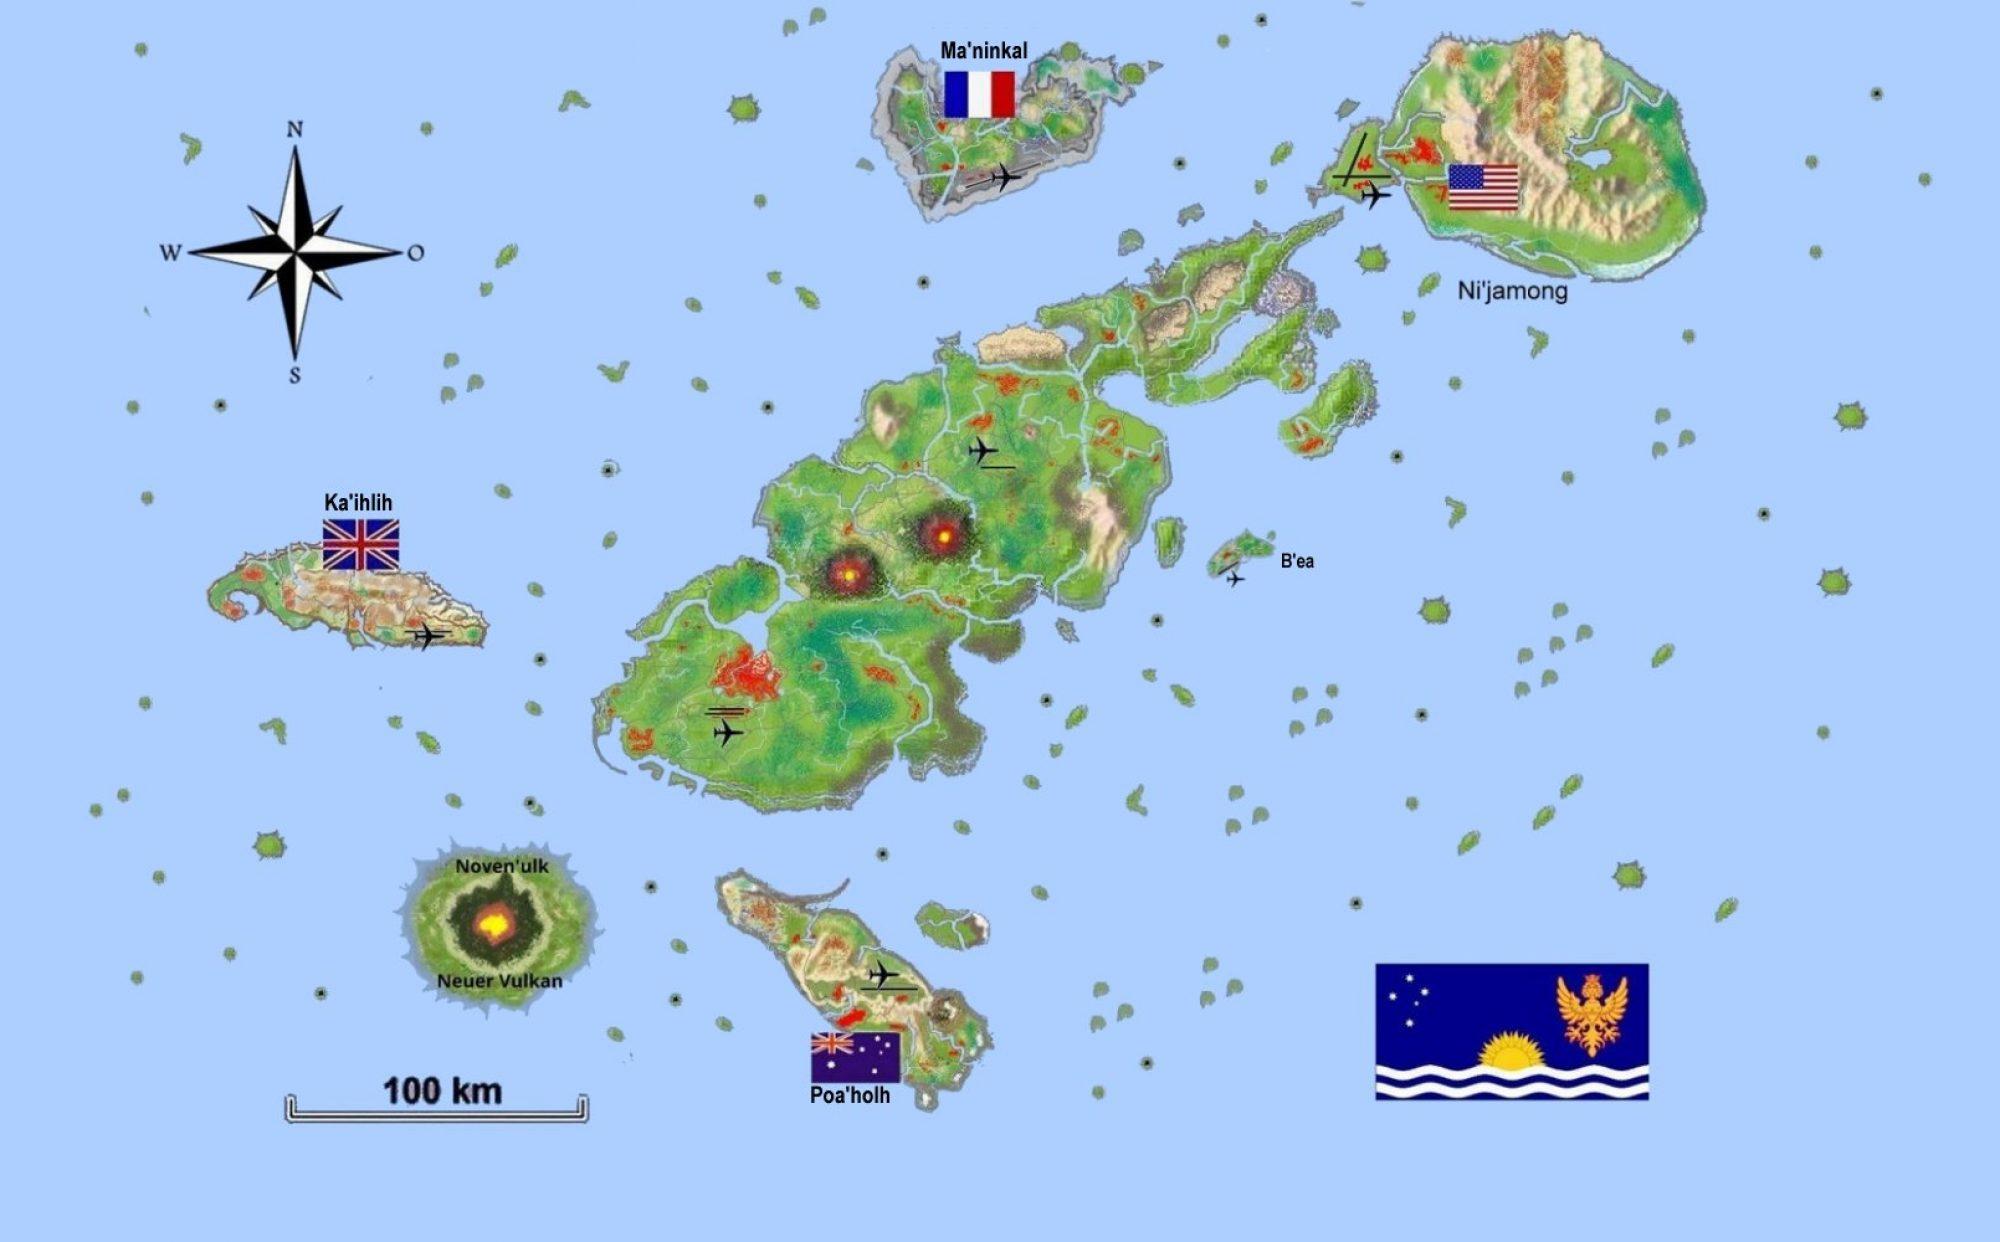 Soulebda eine Insel im Pazifik